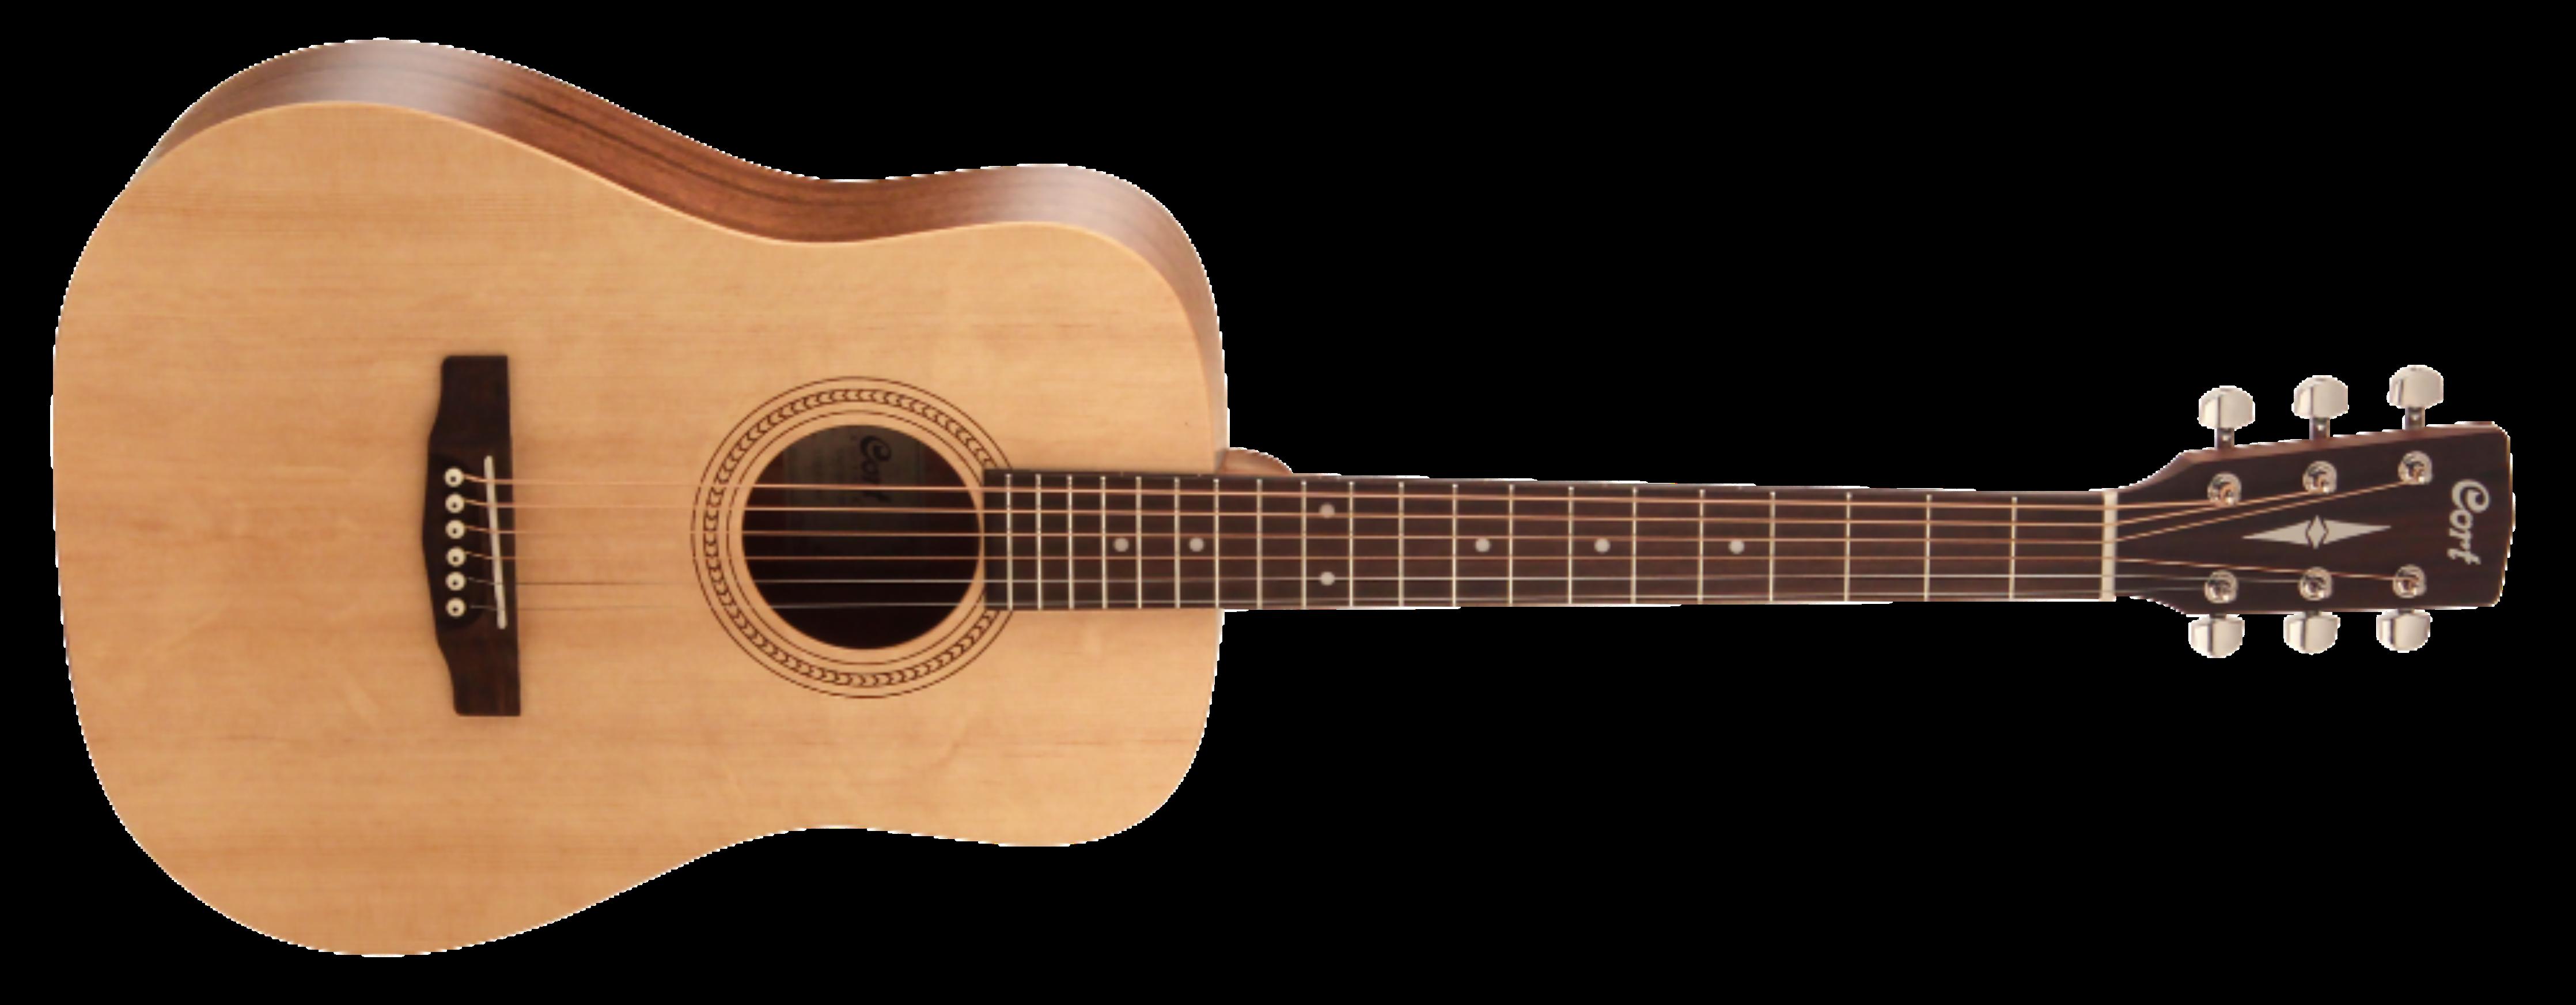 Gitarre Cort Earth 50 Easy Play